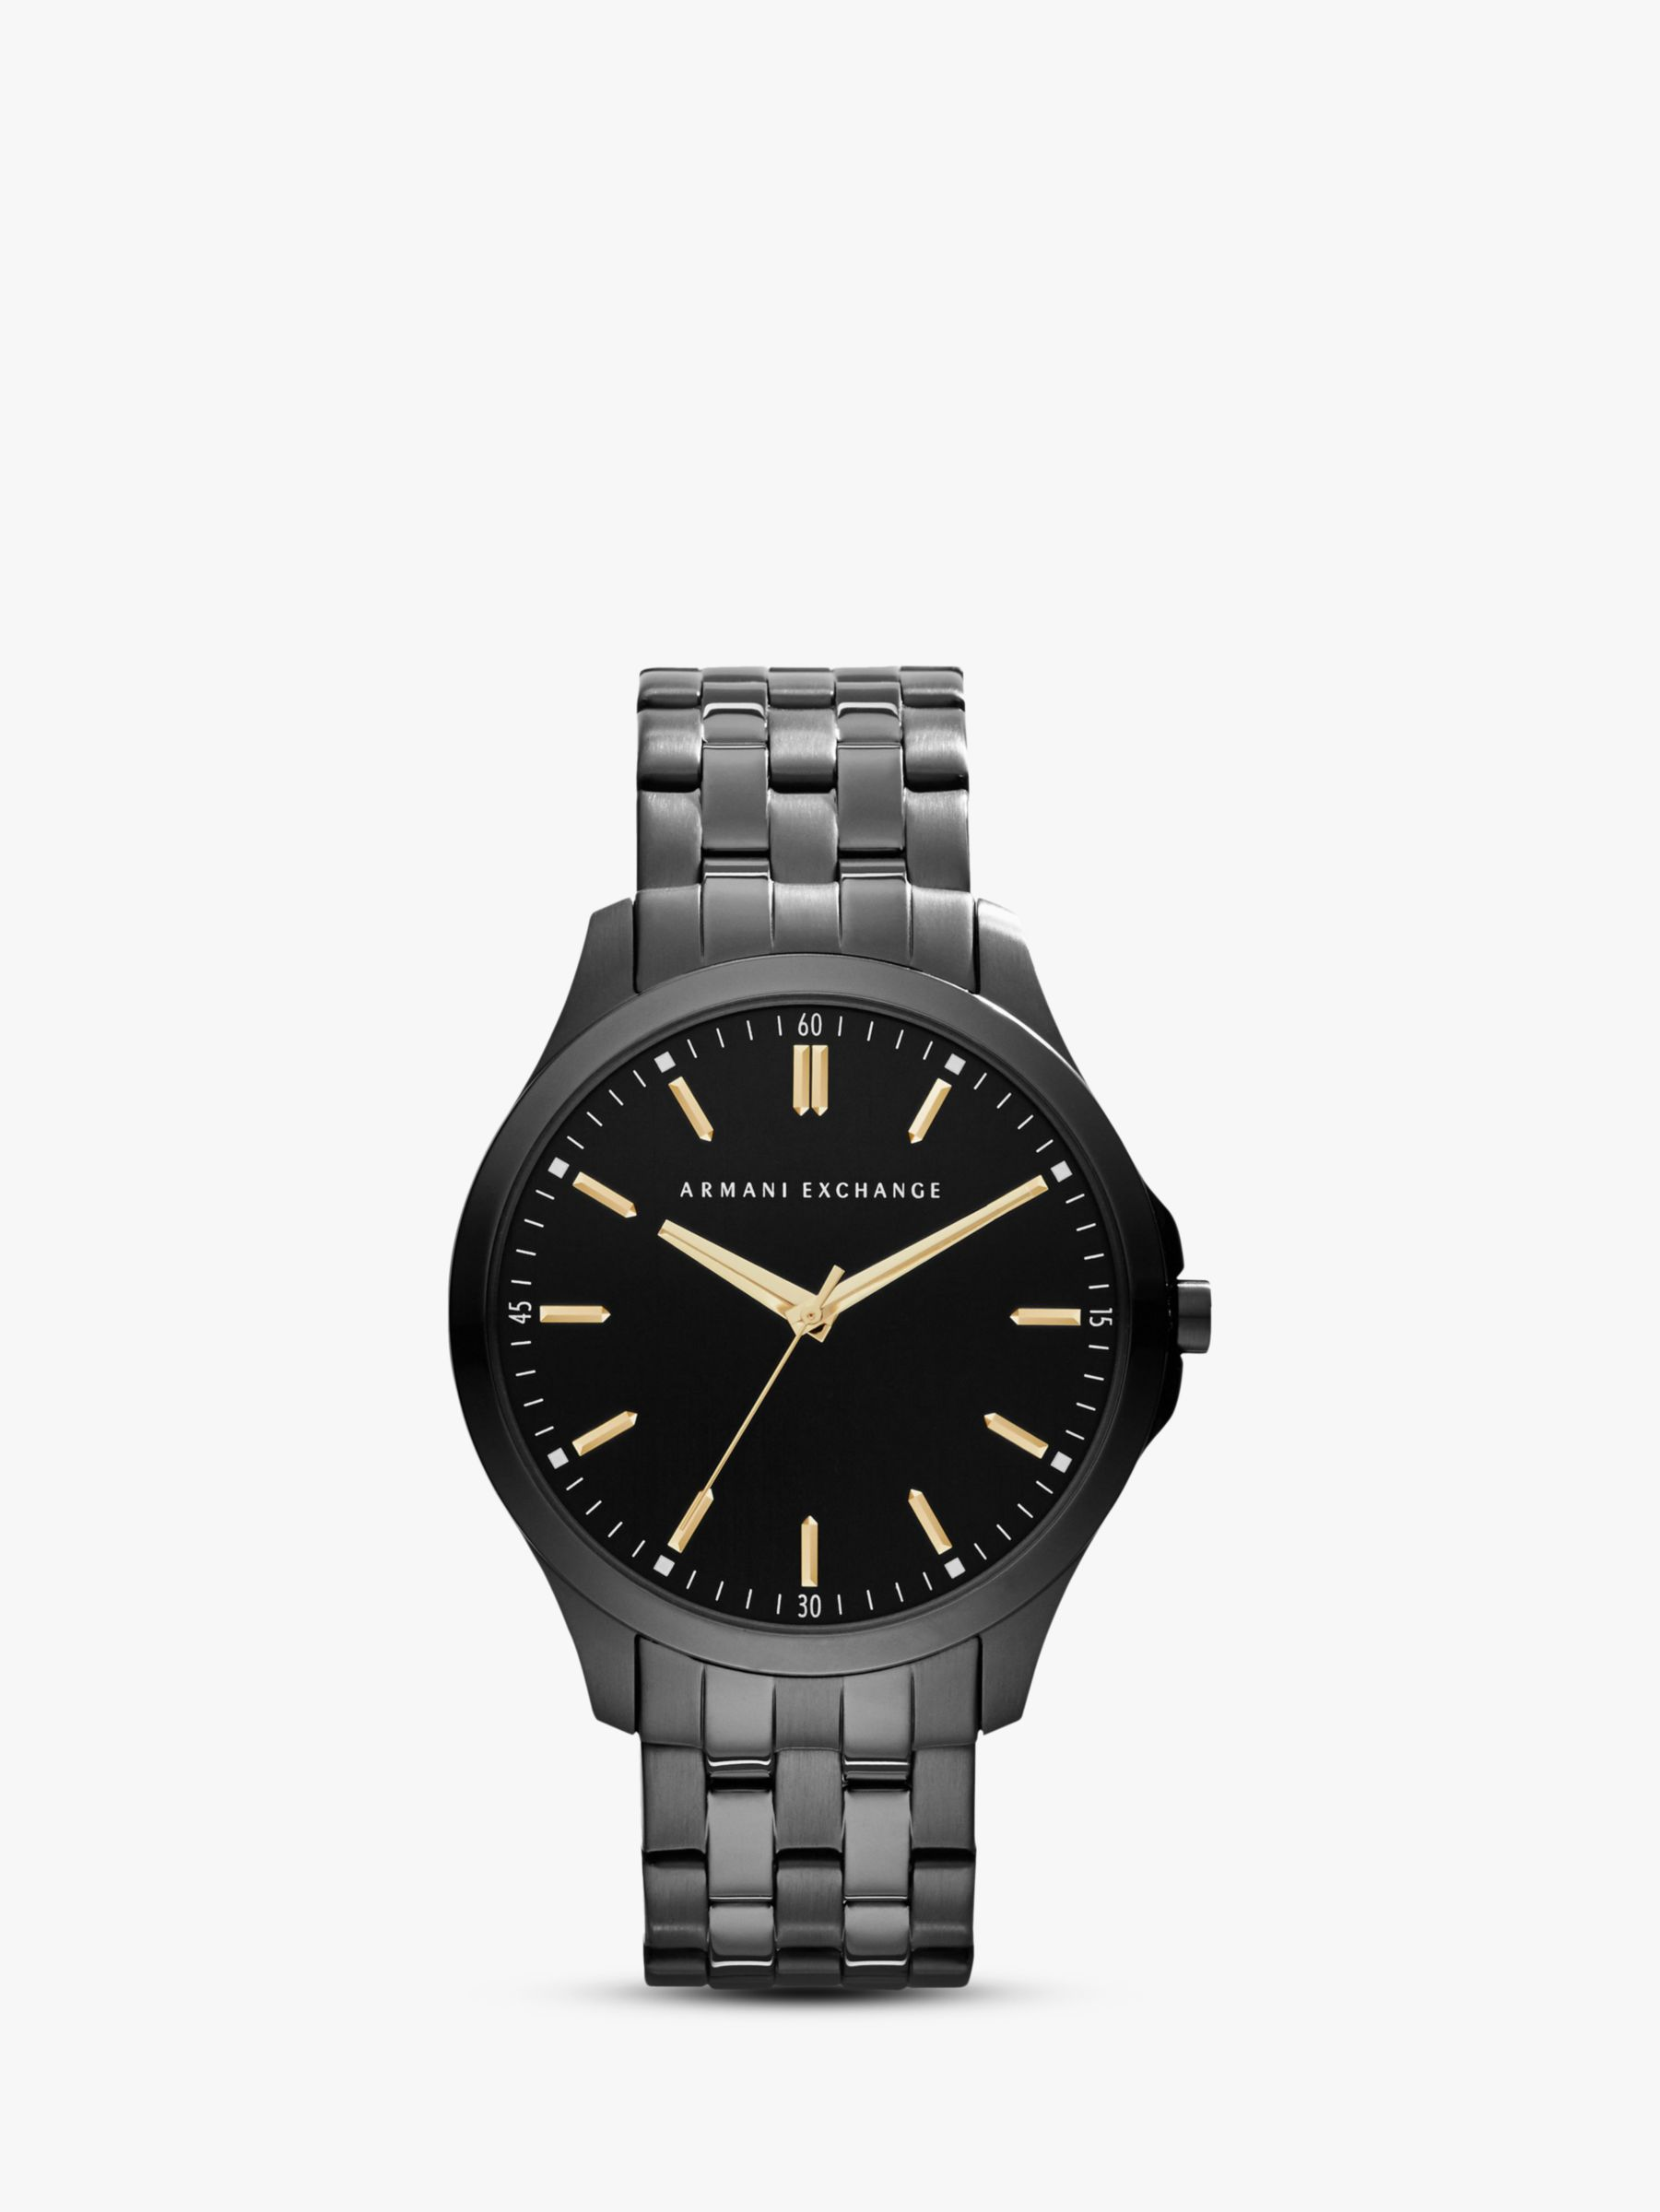 Armani Exchange Armani Exchange AX2144 Men's Stainless Streel Bracelet Strap Watch, Gunmetal/Black